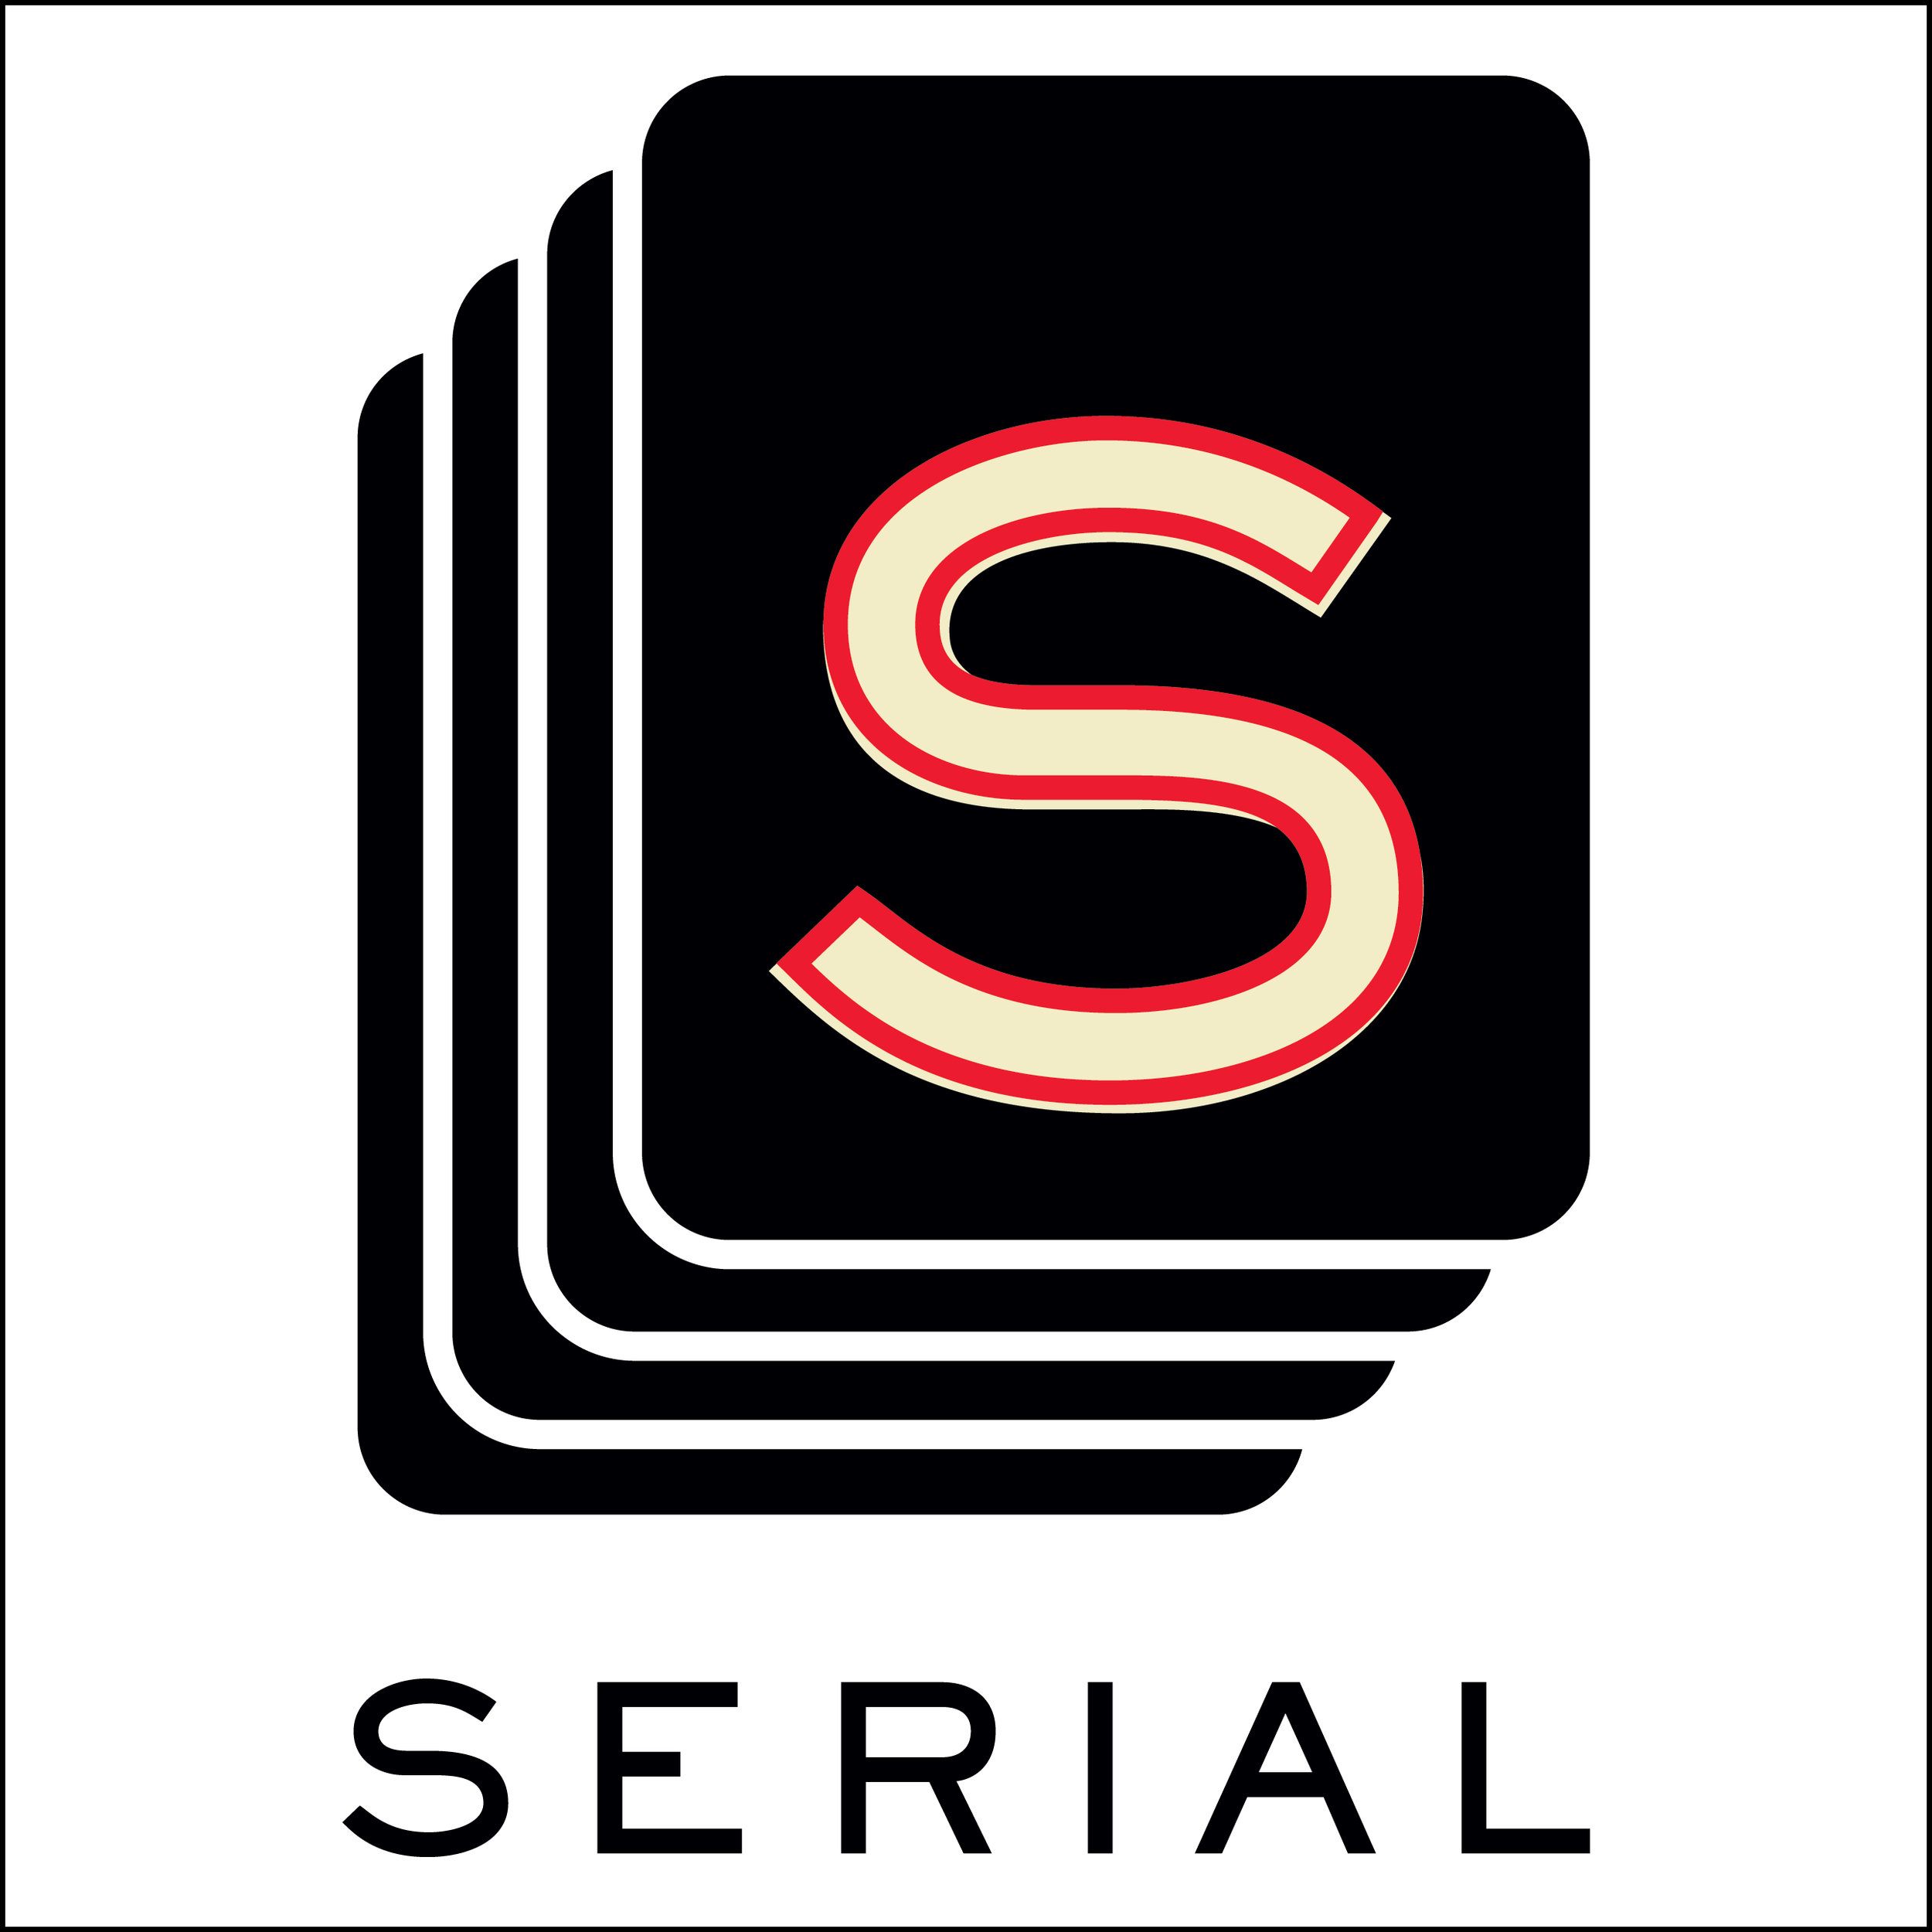 serial-itunes-logo.jpg